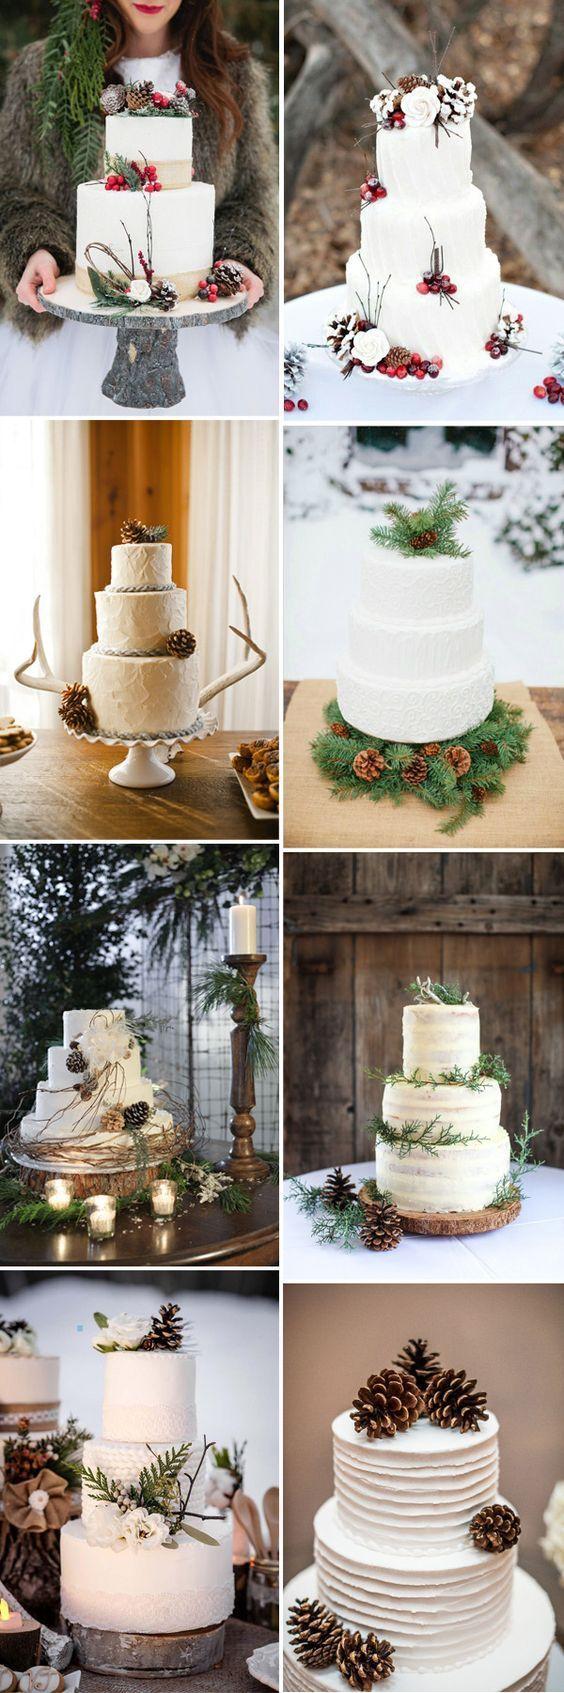 best Wedding Themes images on Pinterest  Pink camo wedding